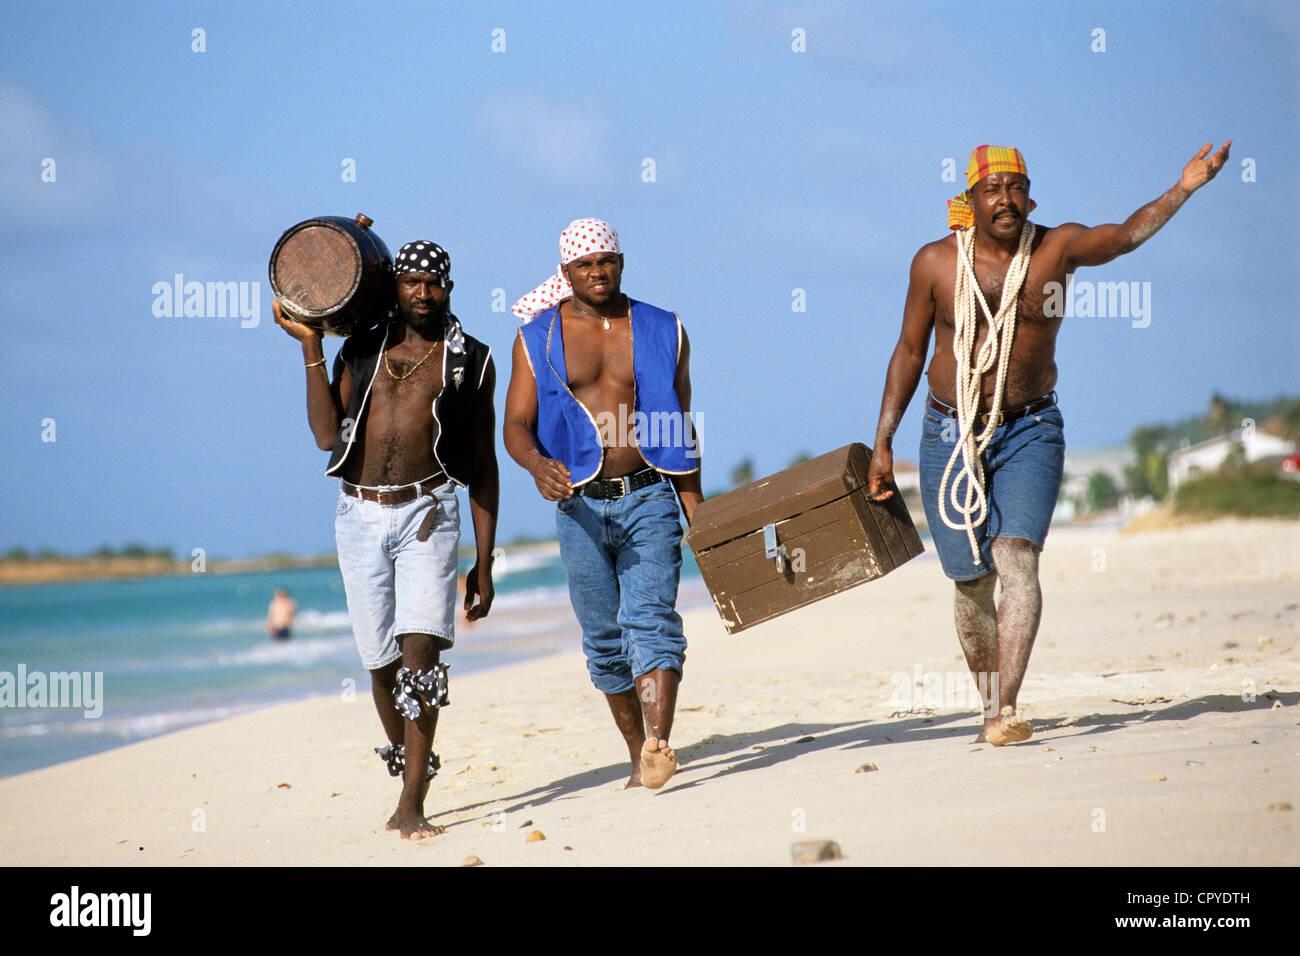 Antigua and Barbuda, Antigua Island, crew of the Jolly Roger sailboat play acting as corsairs - Stock Image